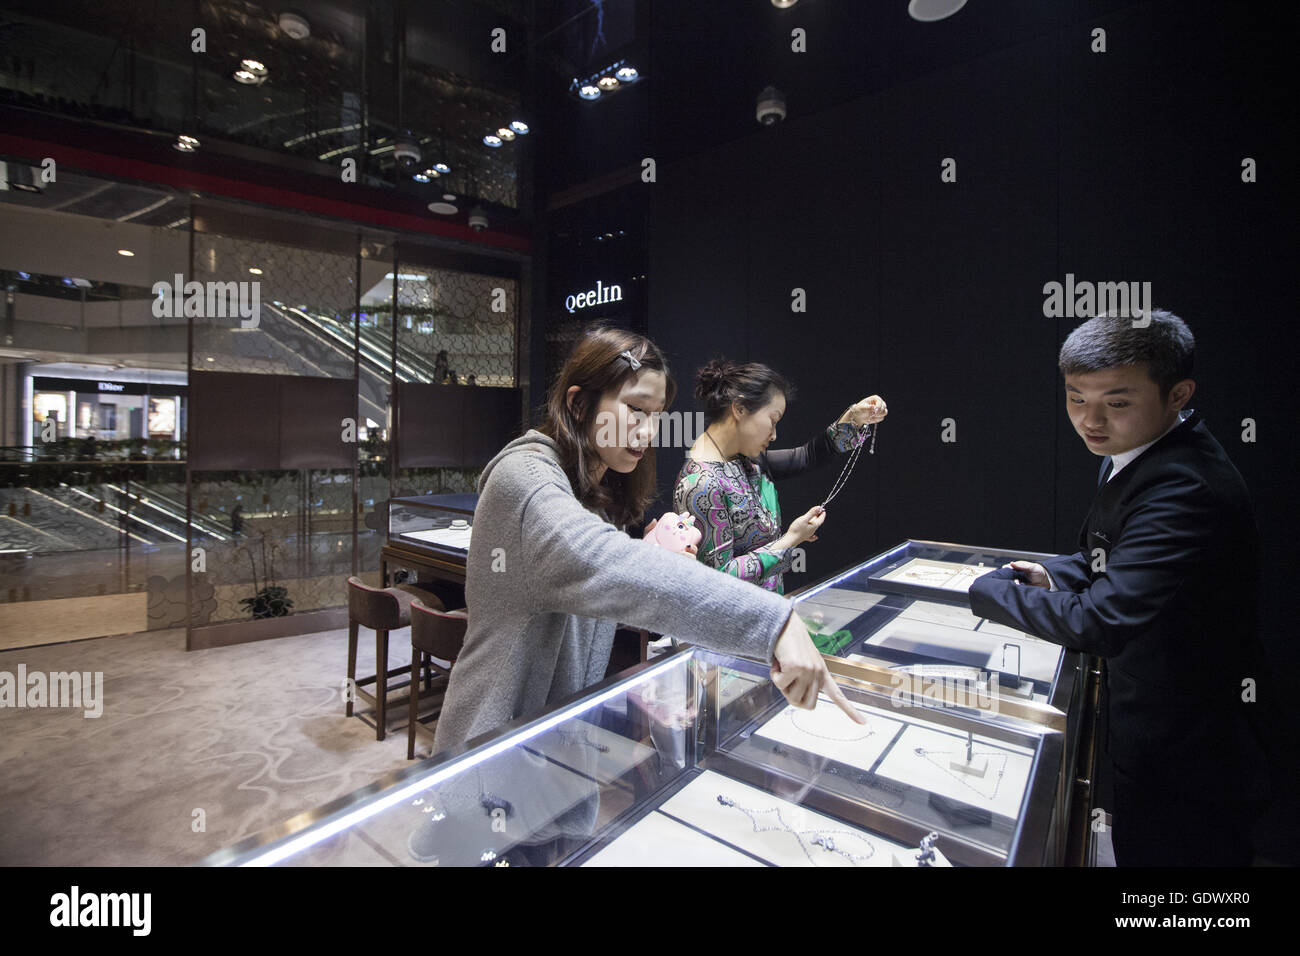 Kunden betrachten Schmuck Qeelin Schmuck Shop am 4. Dezember Stockbild